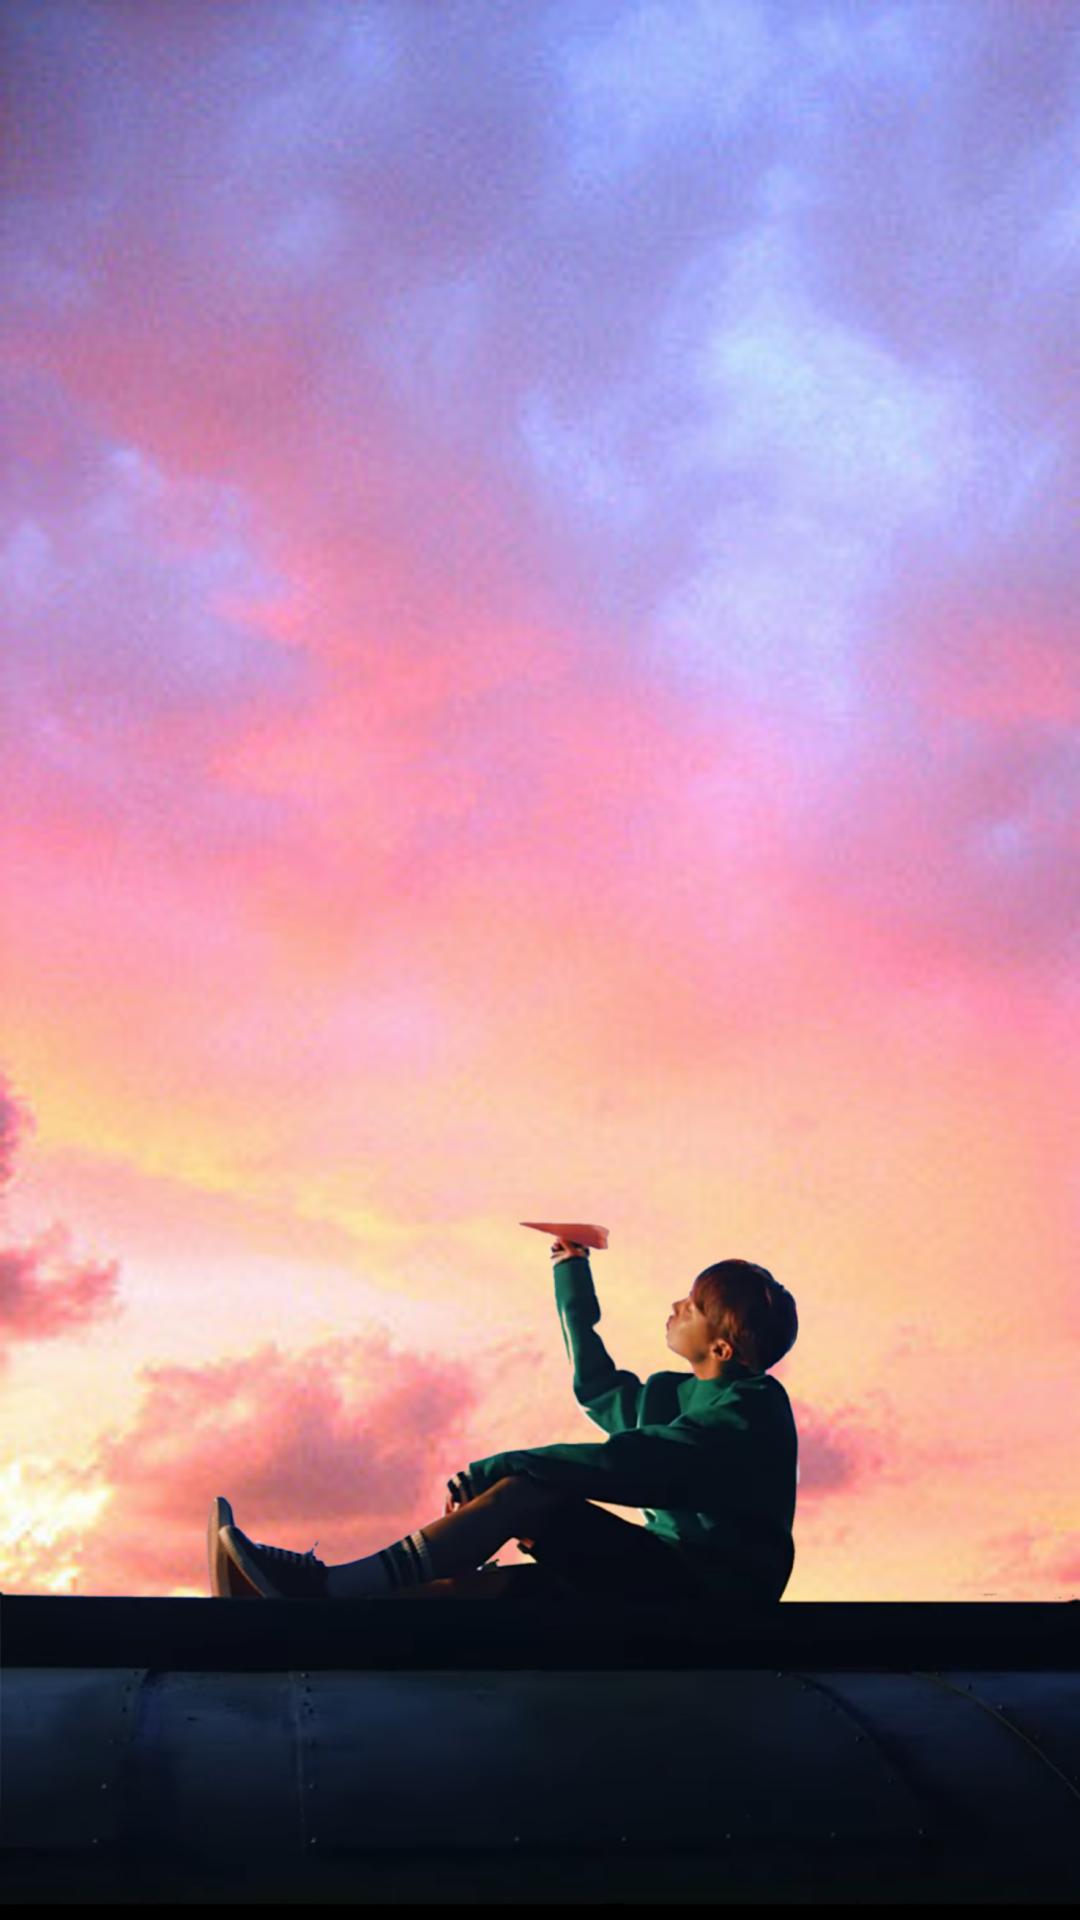 jin wallpaper Tumblr Bts lockscreen Fondo de pantalla bts wings 1080x1920